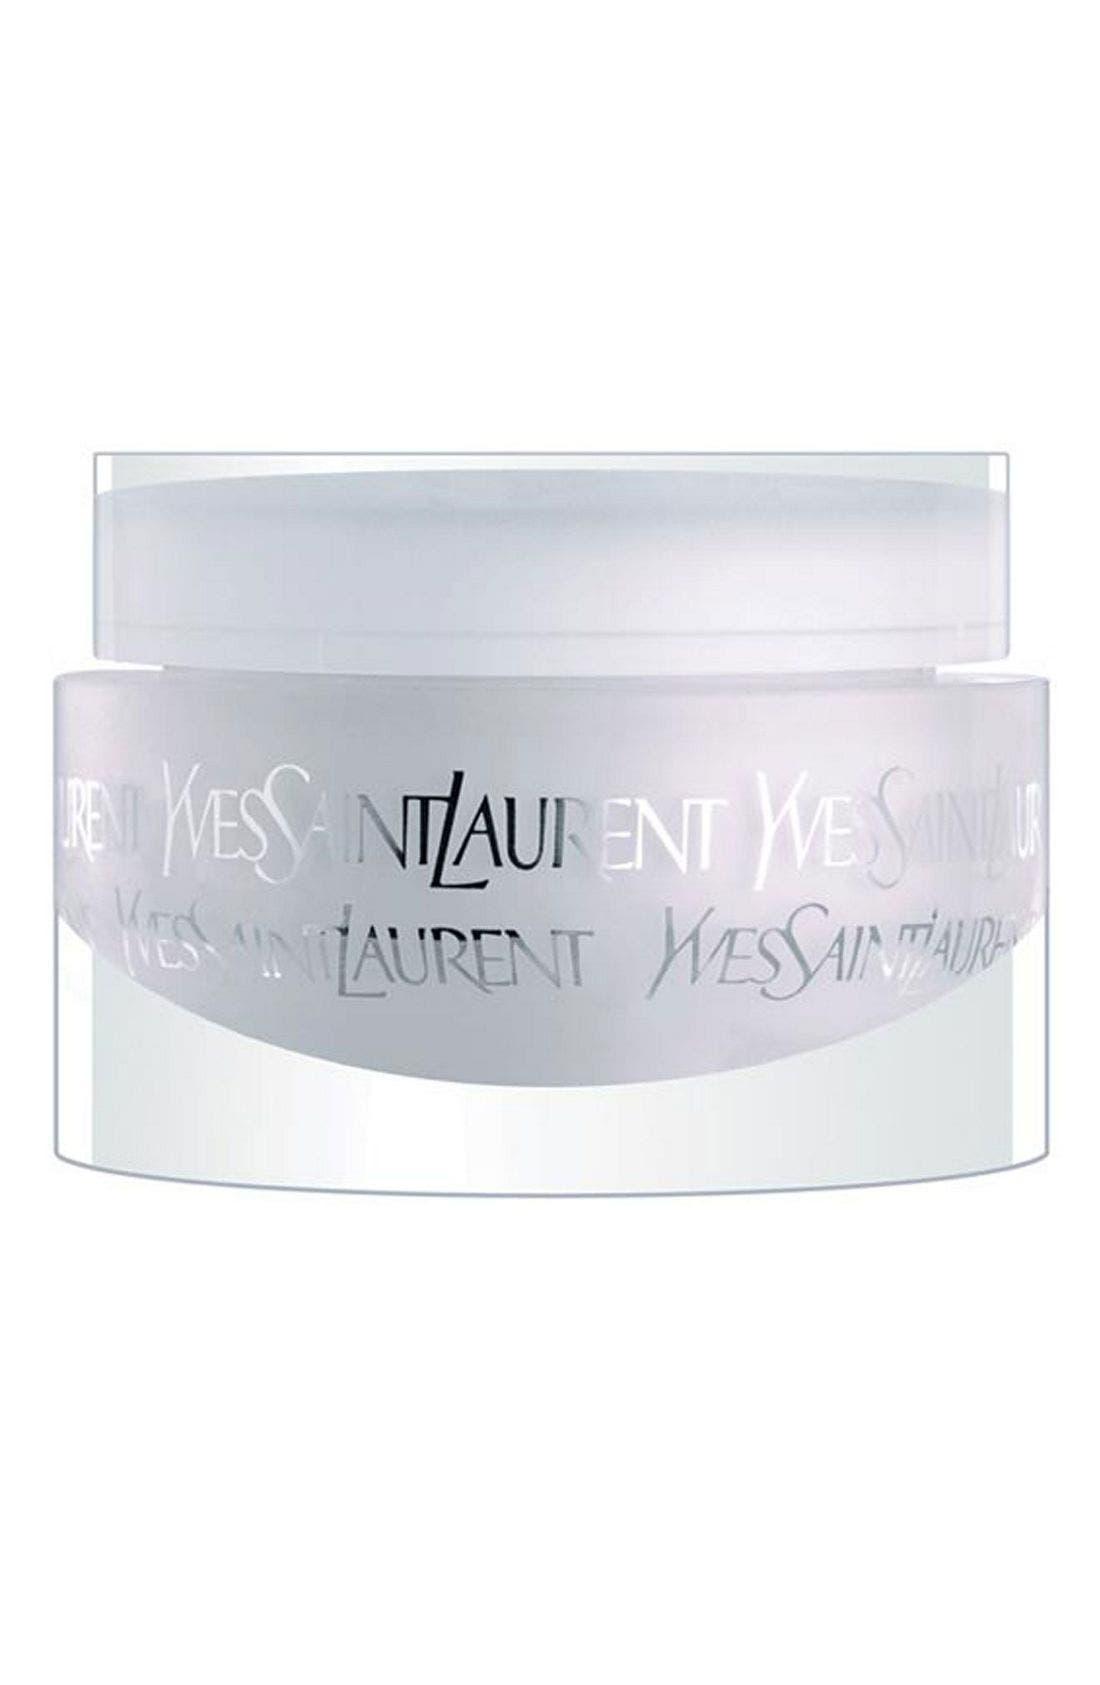 'Temps Majeur' Intense Skin Supplement,                         Main,                         color, 000